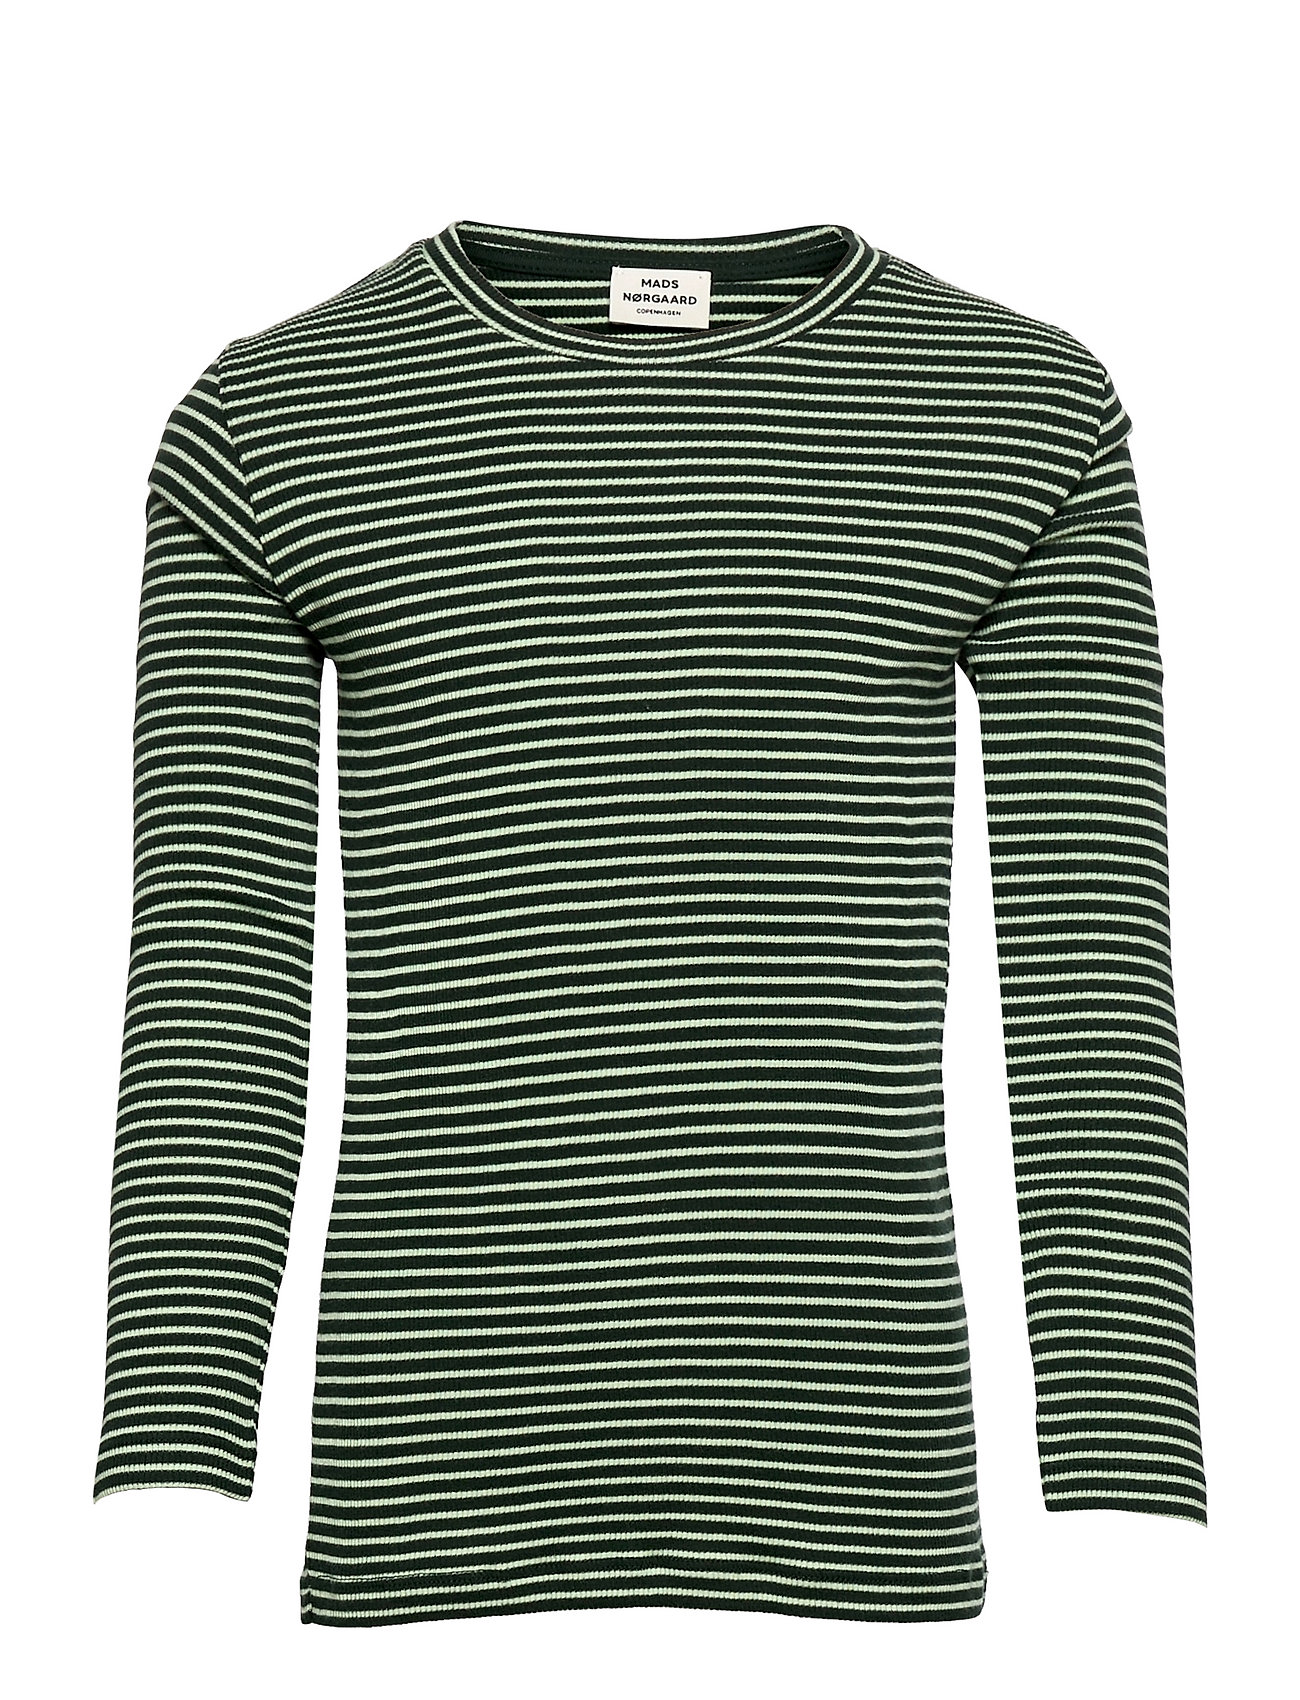 2x2 Cotton Stripe Talino Langærmet T-shirt Grøn Mads Nørgaard